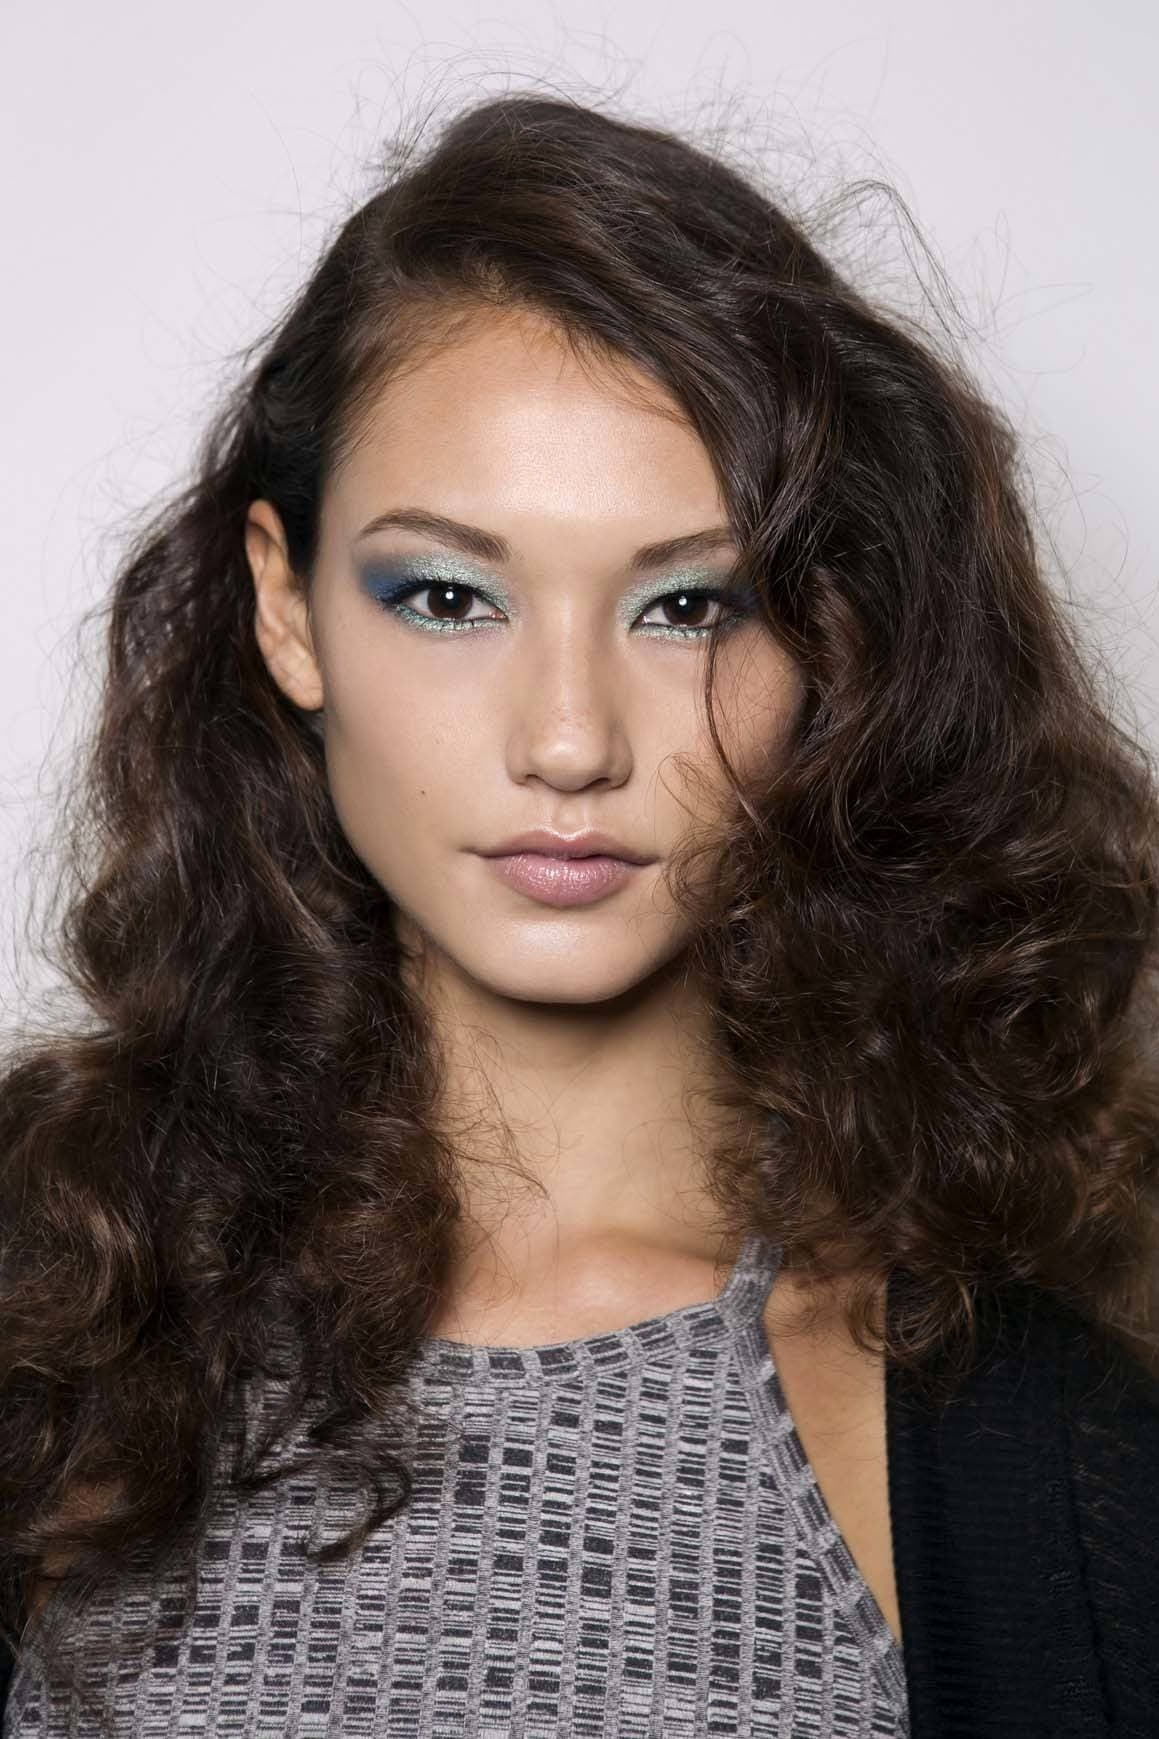 Wanita asia dengan warna rambut cokelat gaya rambut 70-an wavy natural